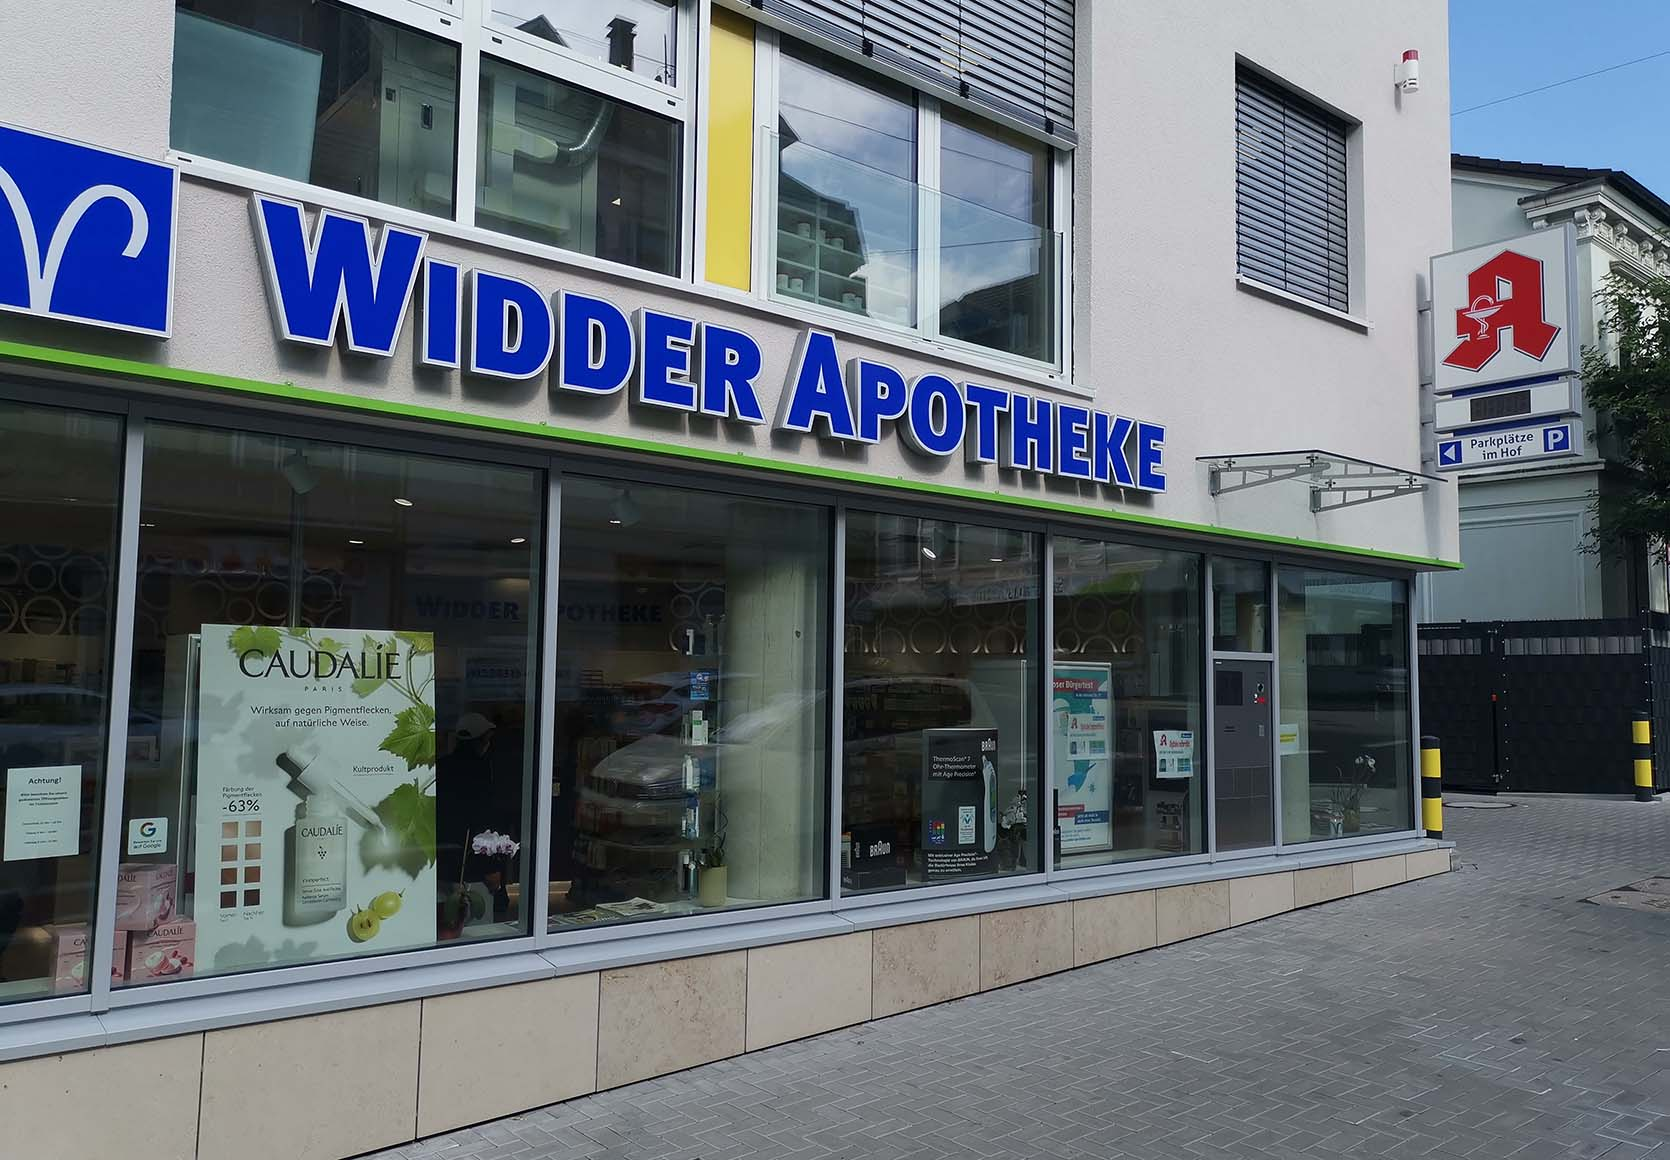 Widder Apotheke in Germany